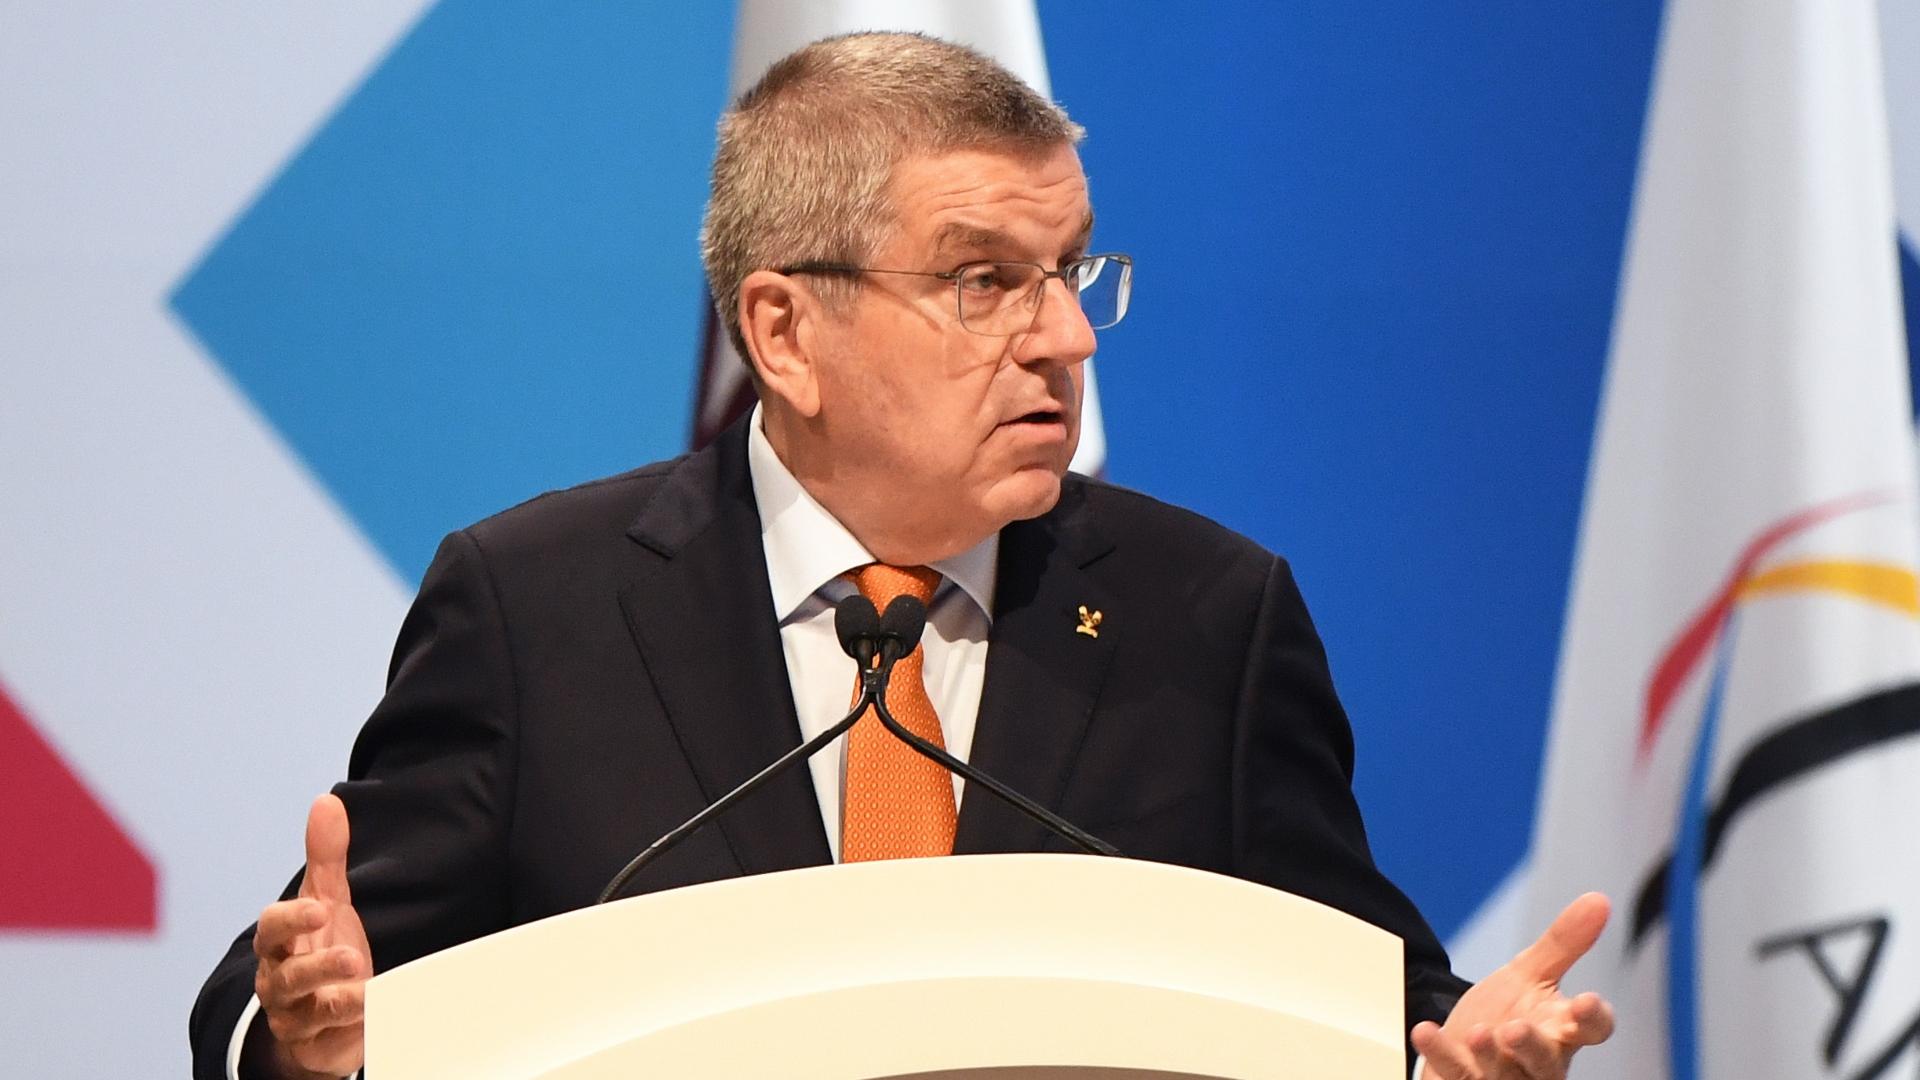 Coronavirus: Tokyo Olympics in 2021 under threat, warns IOC chief Bach